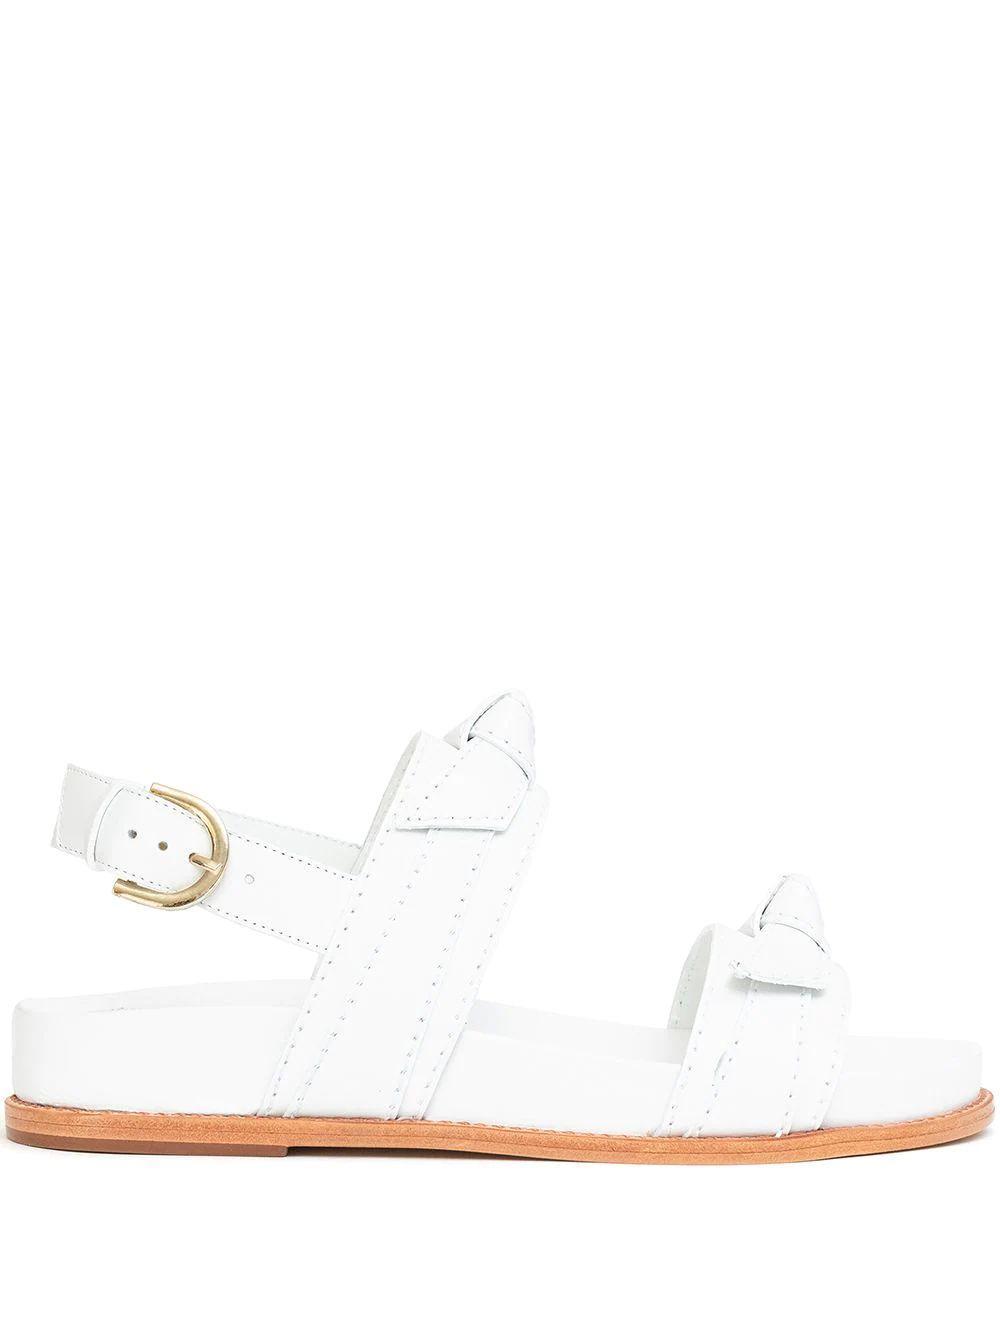 Clarita Sport Sandal Item # B3540900020001